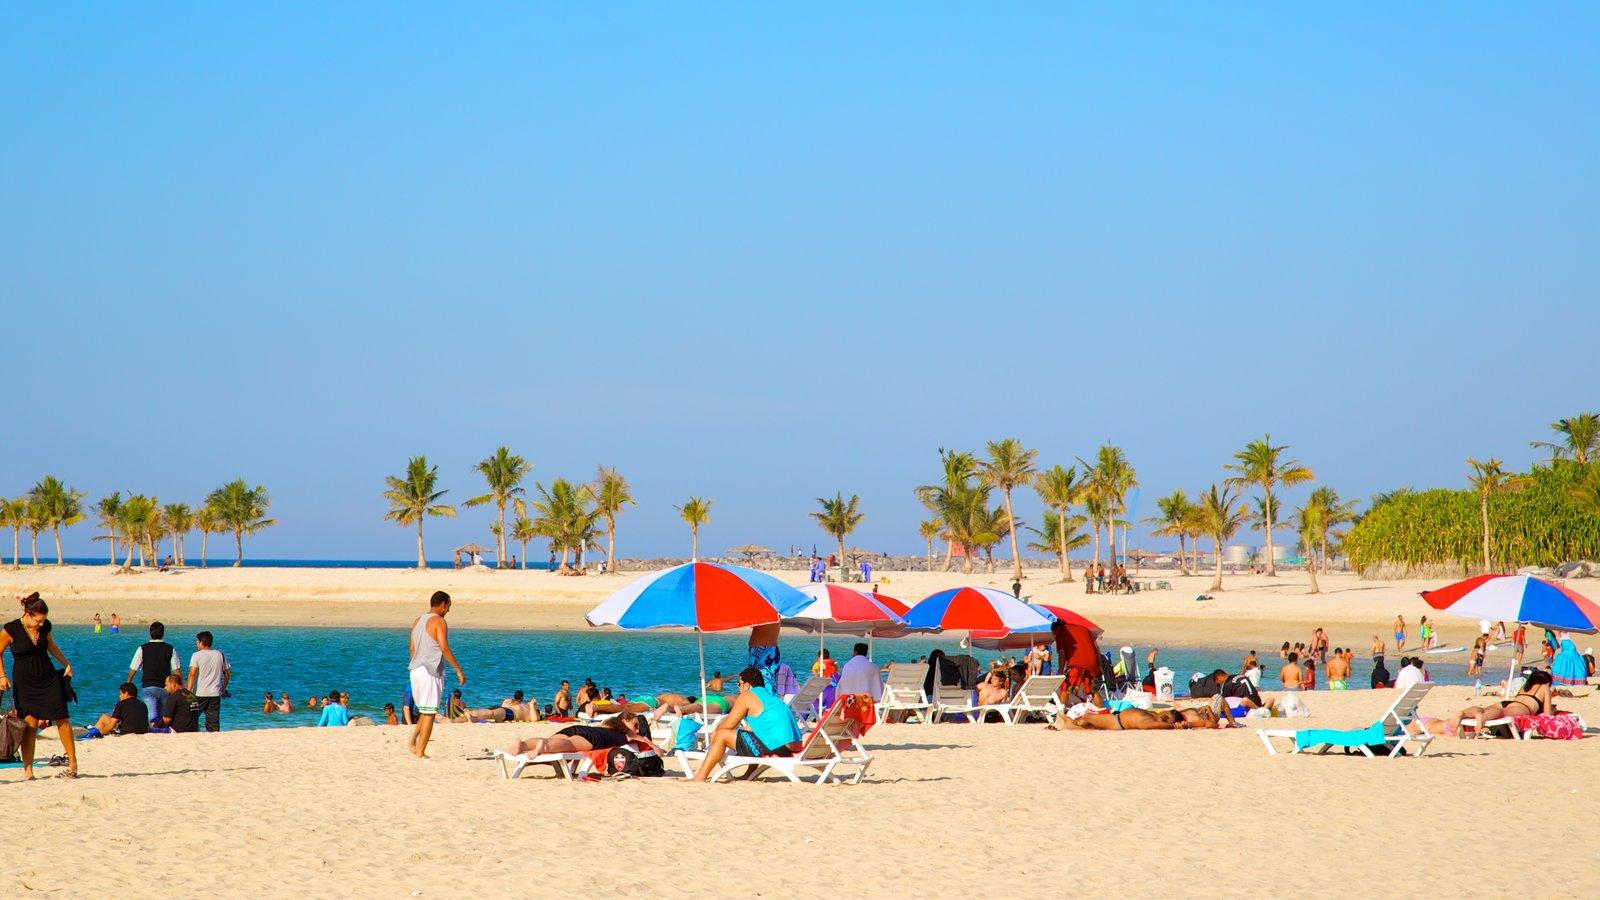 Dubai Emirate showing a beach, tropical scenes and general coastal views